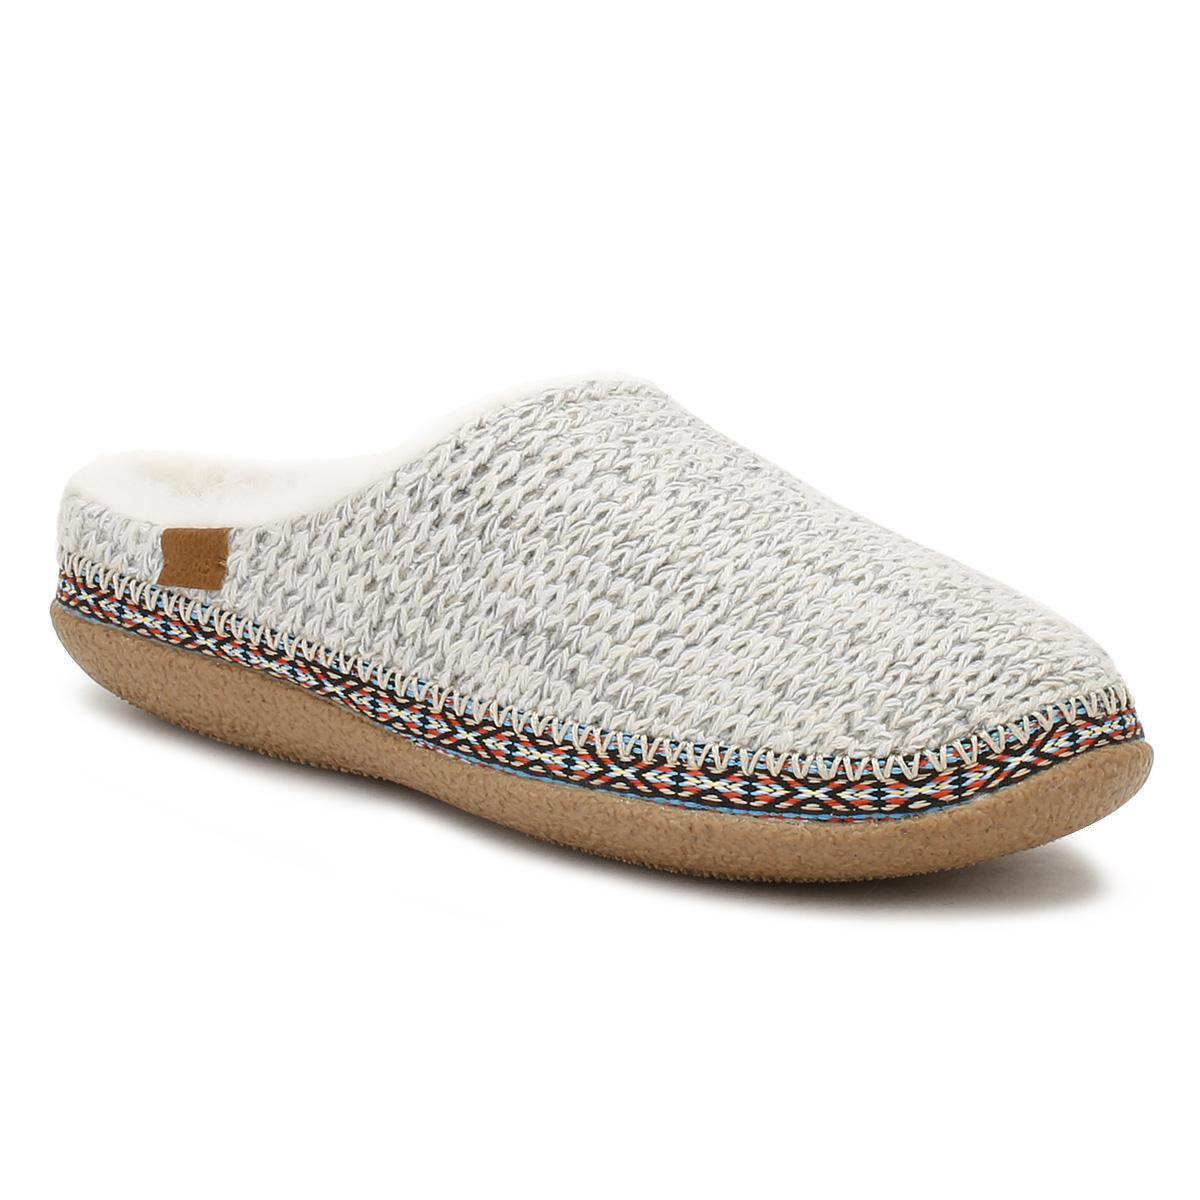 a6fb4f63dd3 Natural Womens Birch Beige Sweater Knit Ivy Slippers